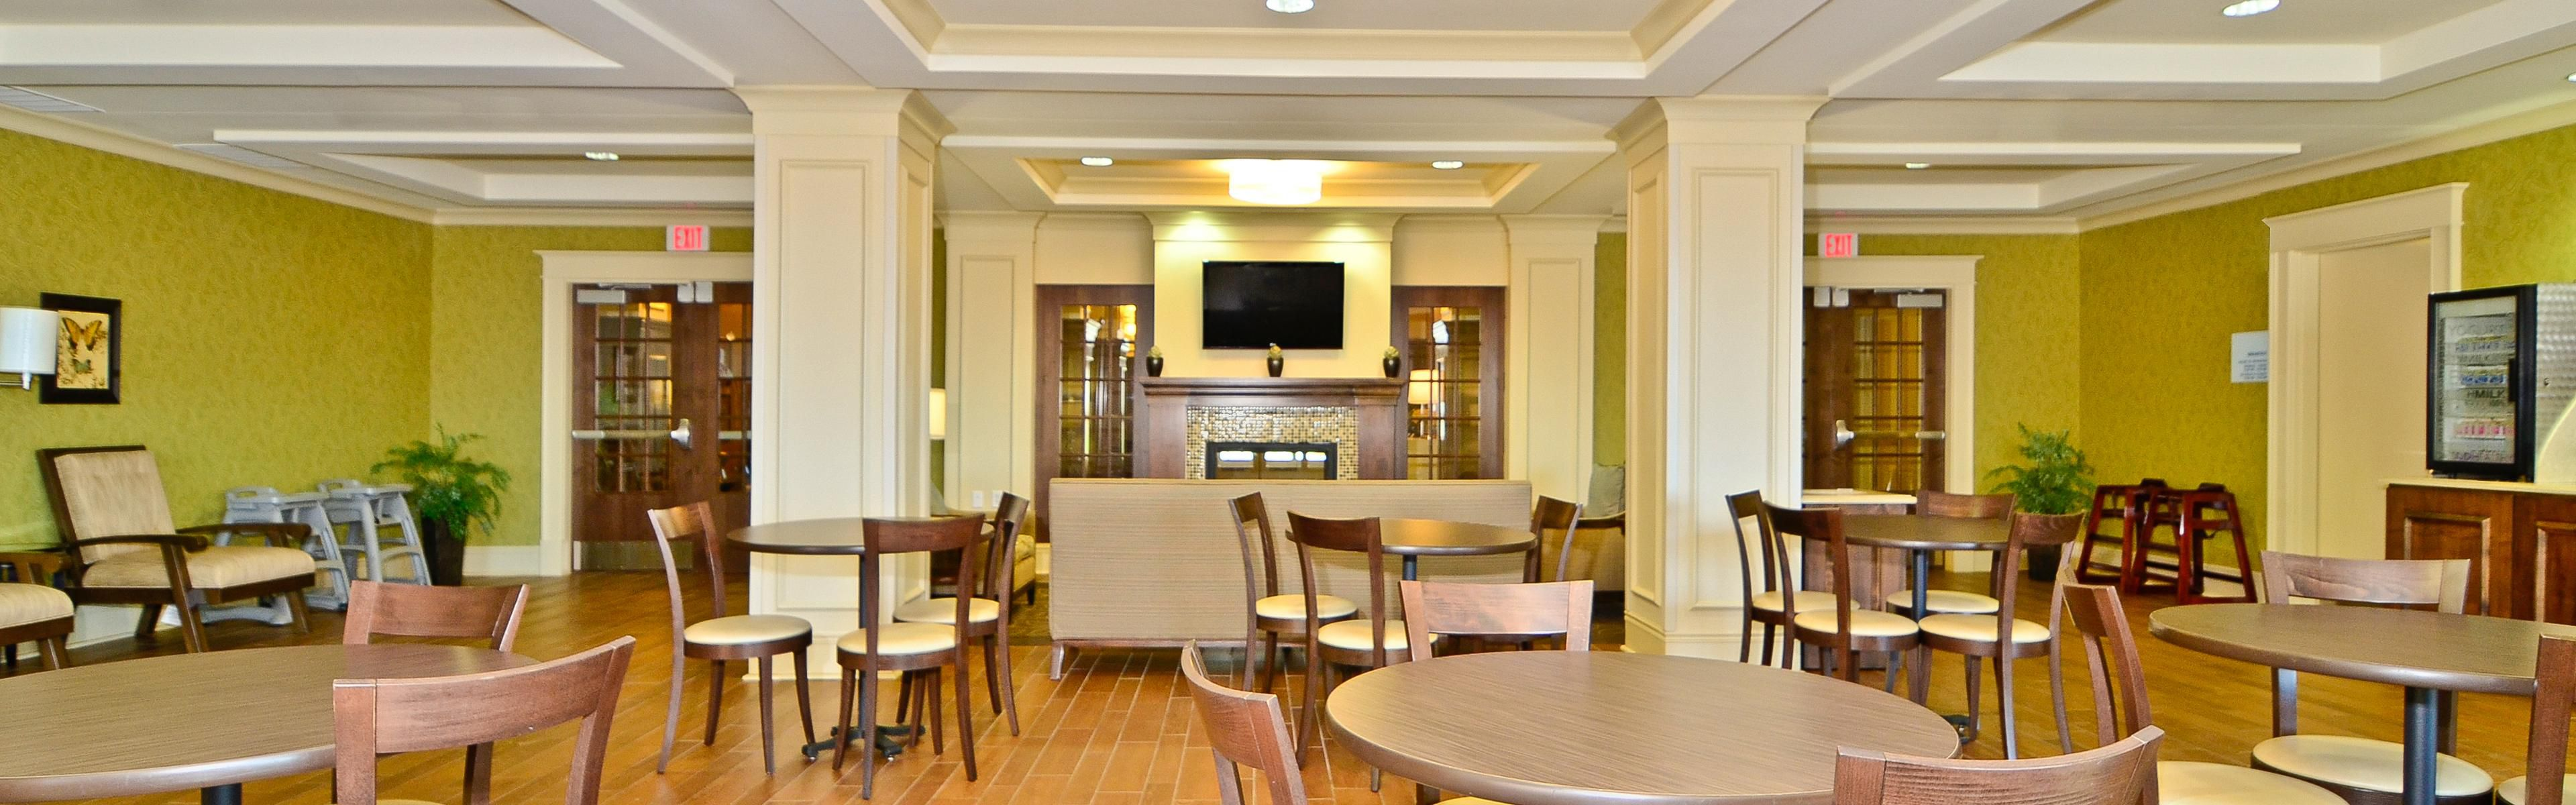 Holiday Inn Express & Suites Williston image 3